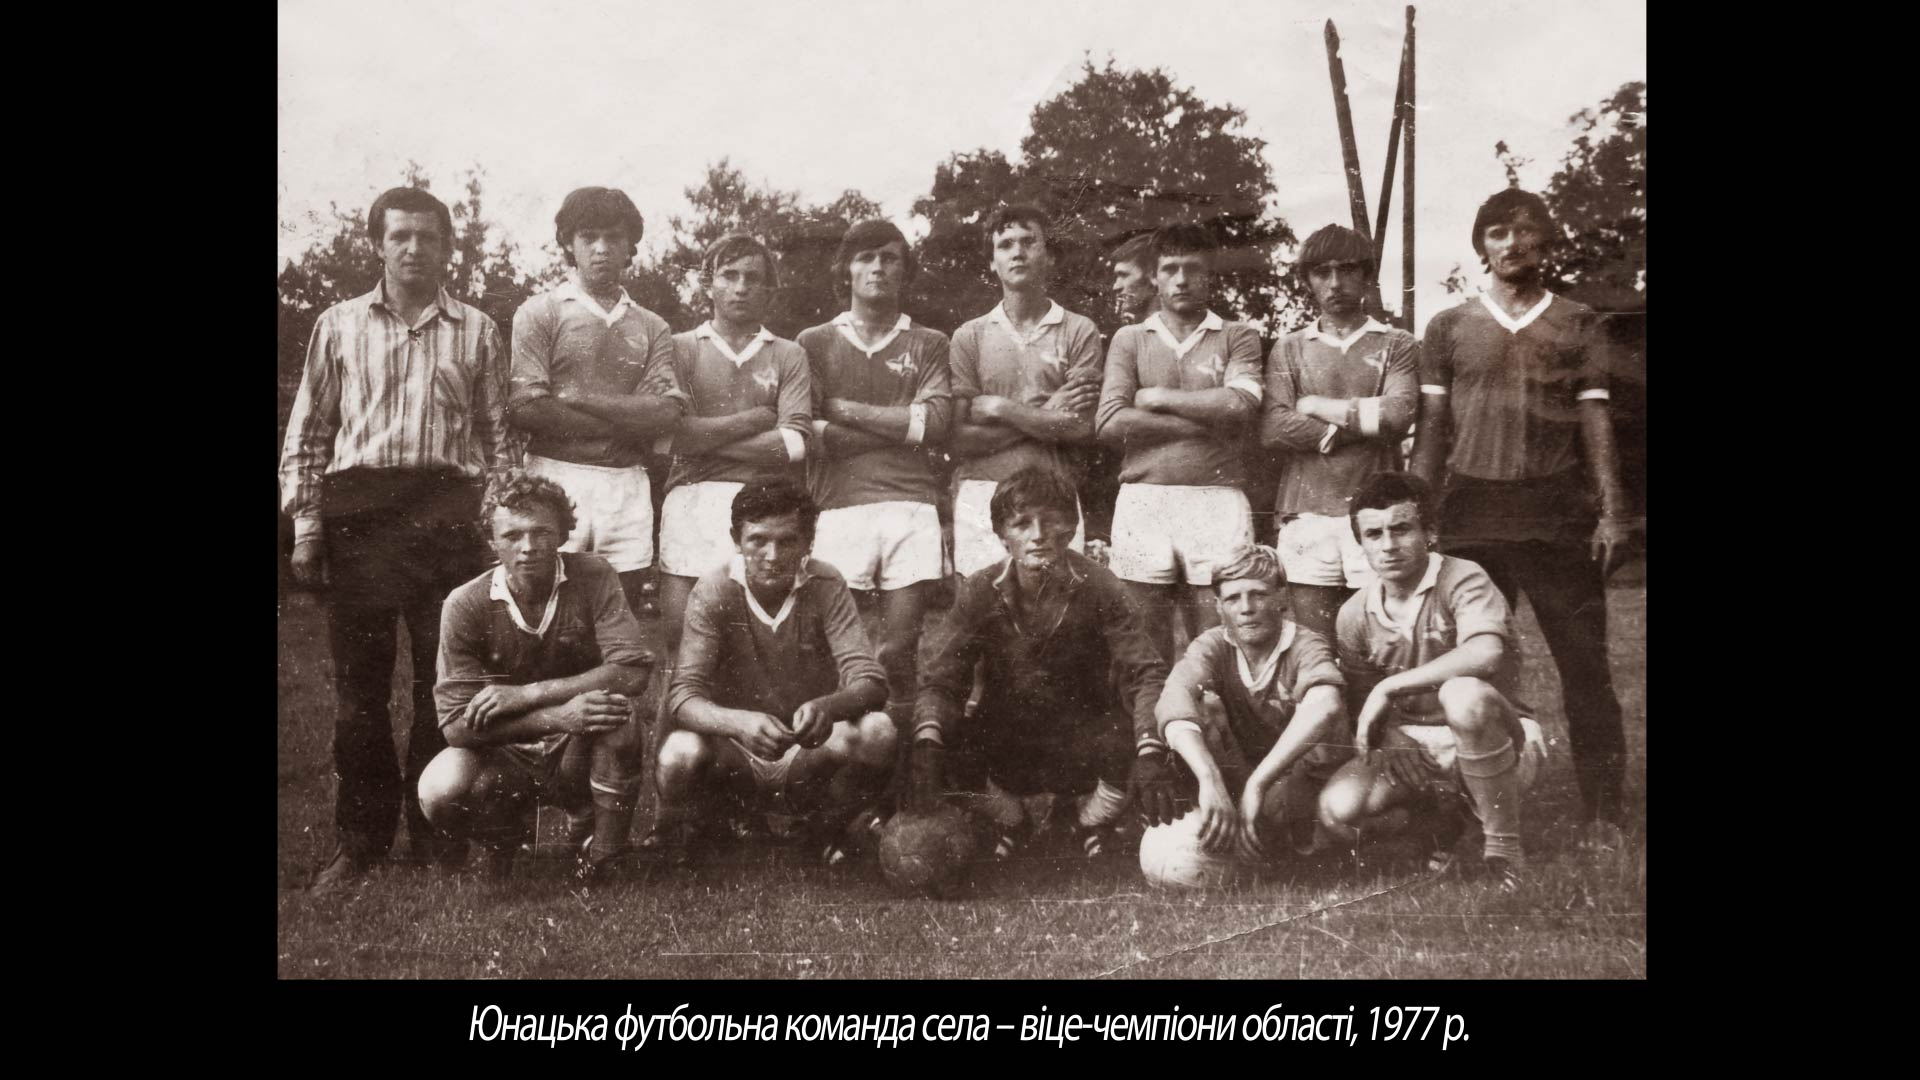 Юнацька футбольна команда села – віце-чемпіони області, 1977 р.